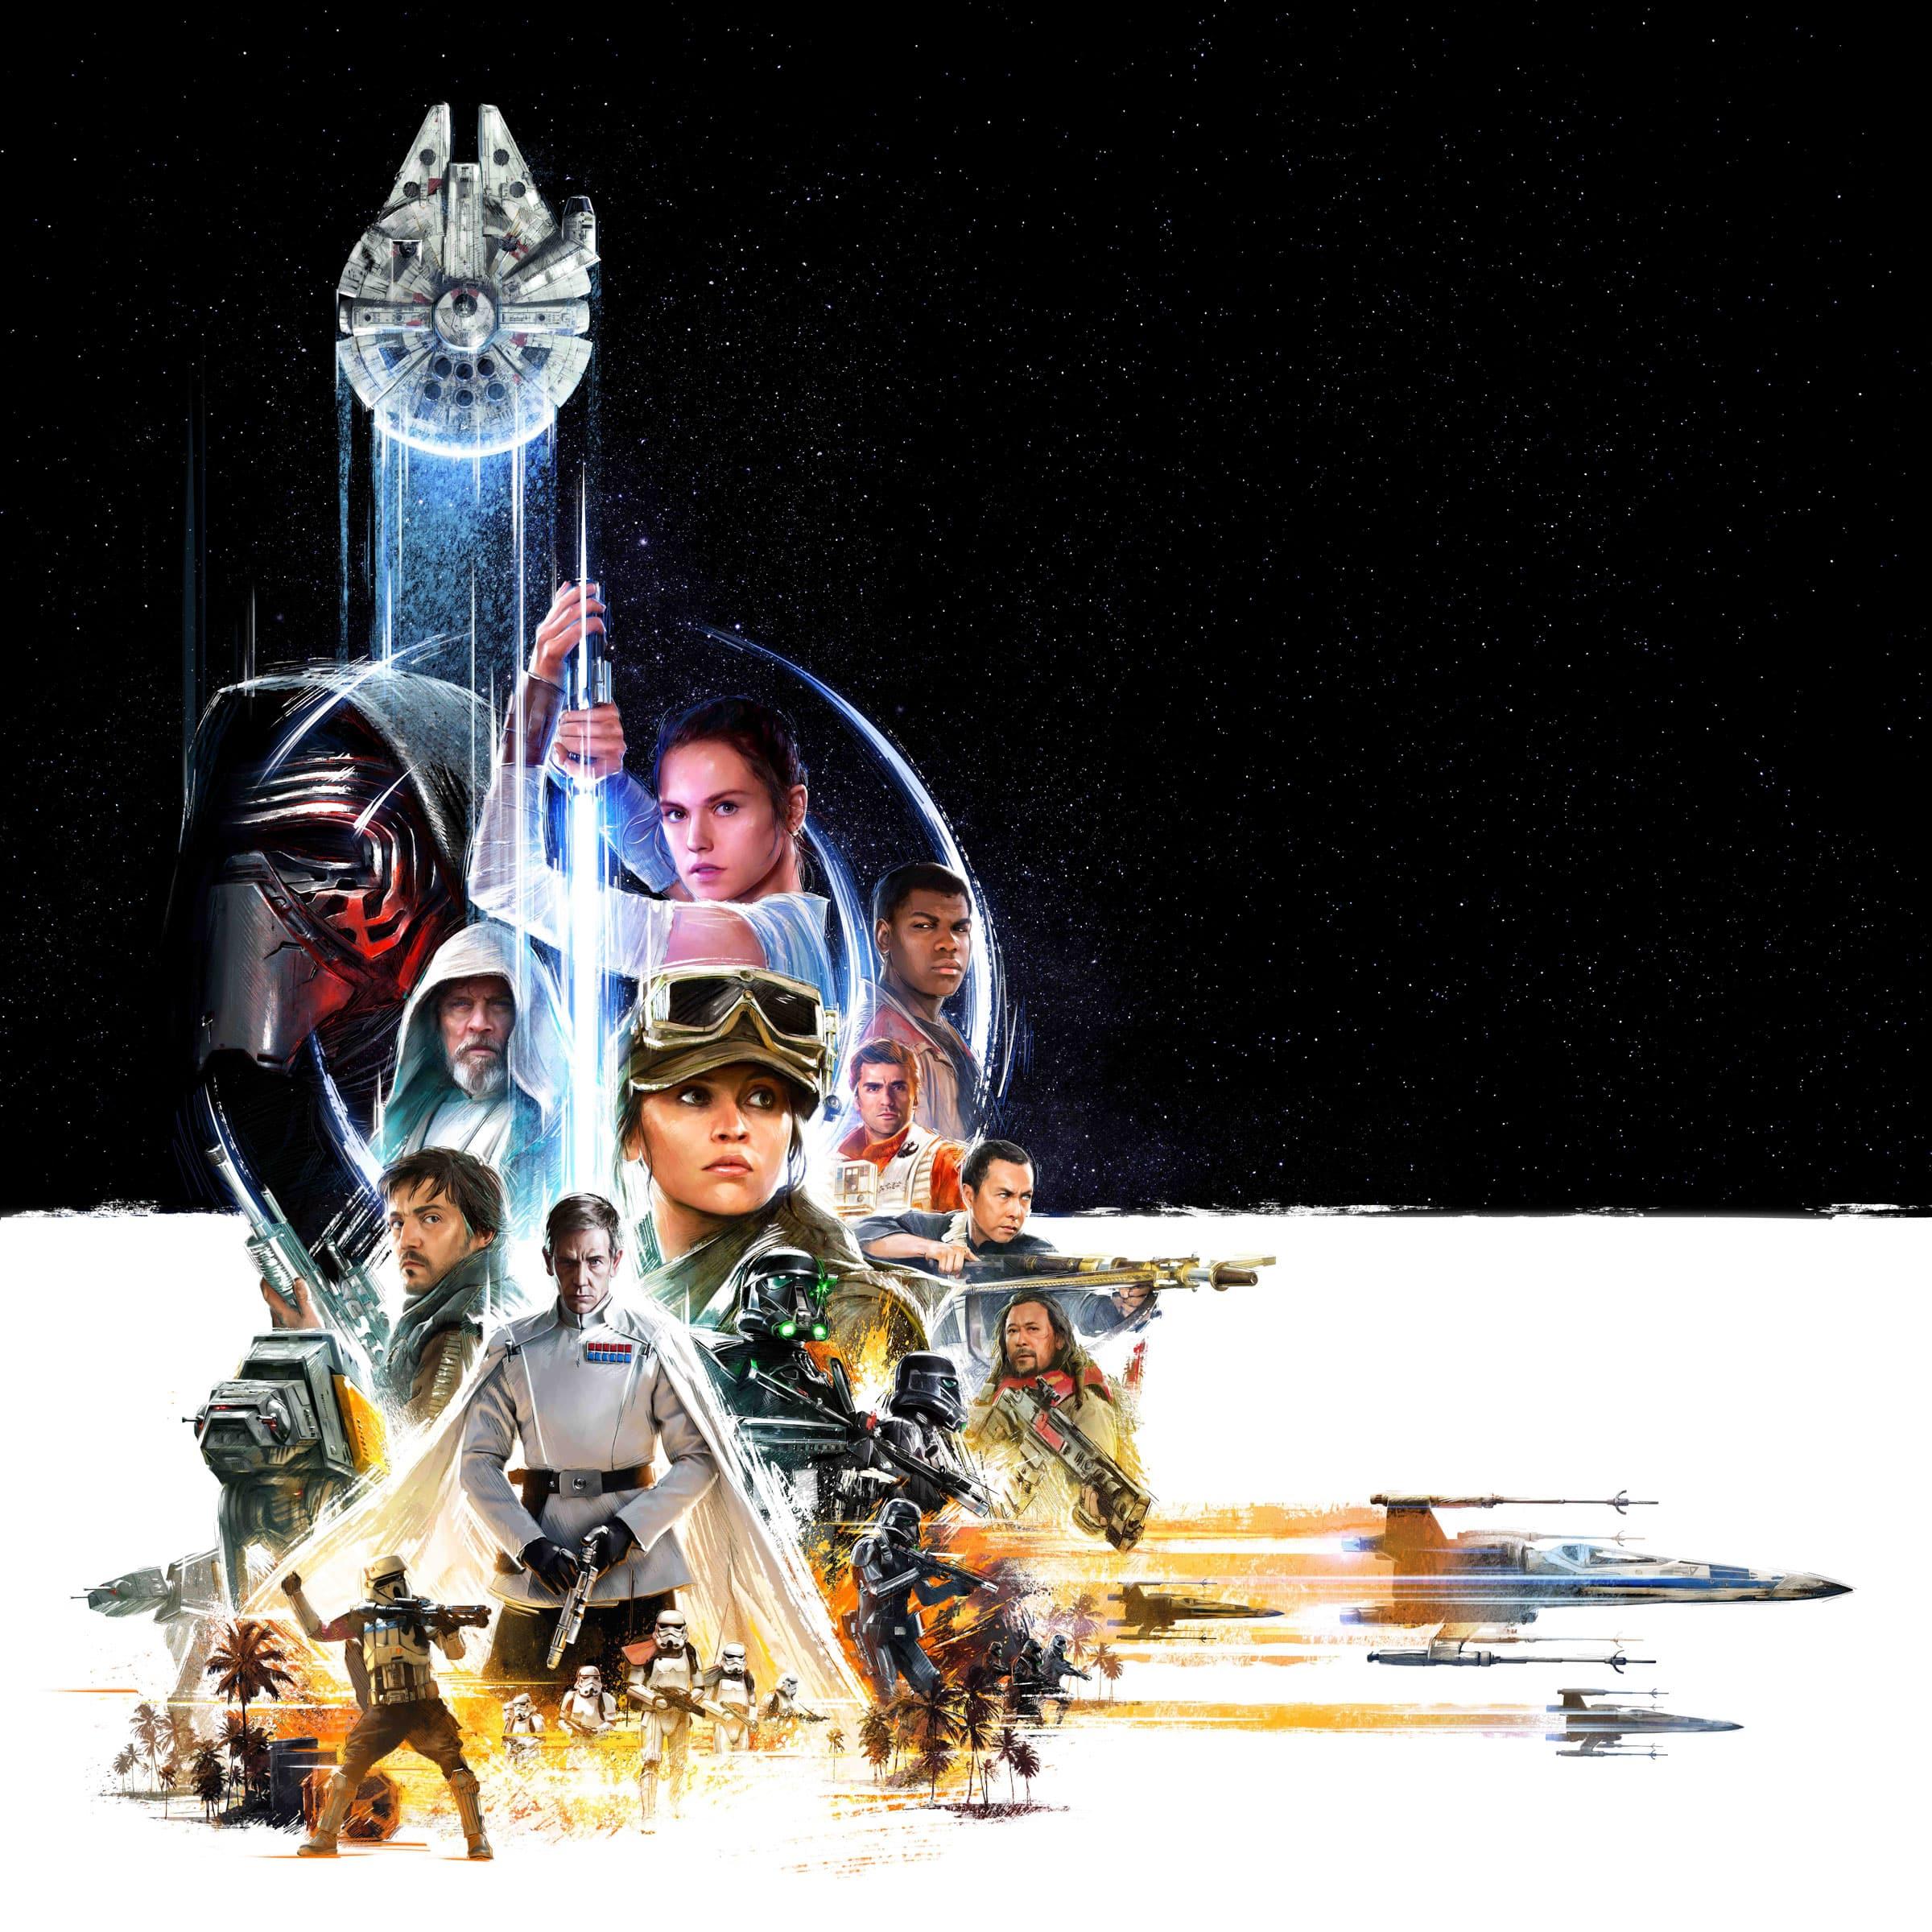 el Key art de Star Wars celebration 2016